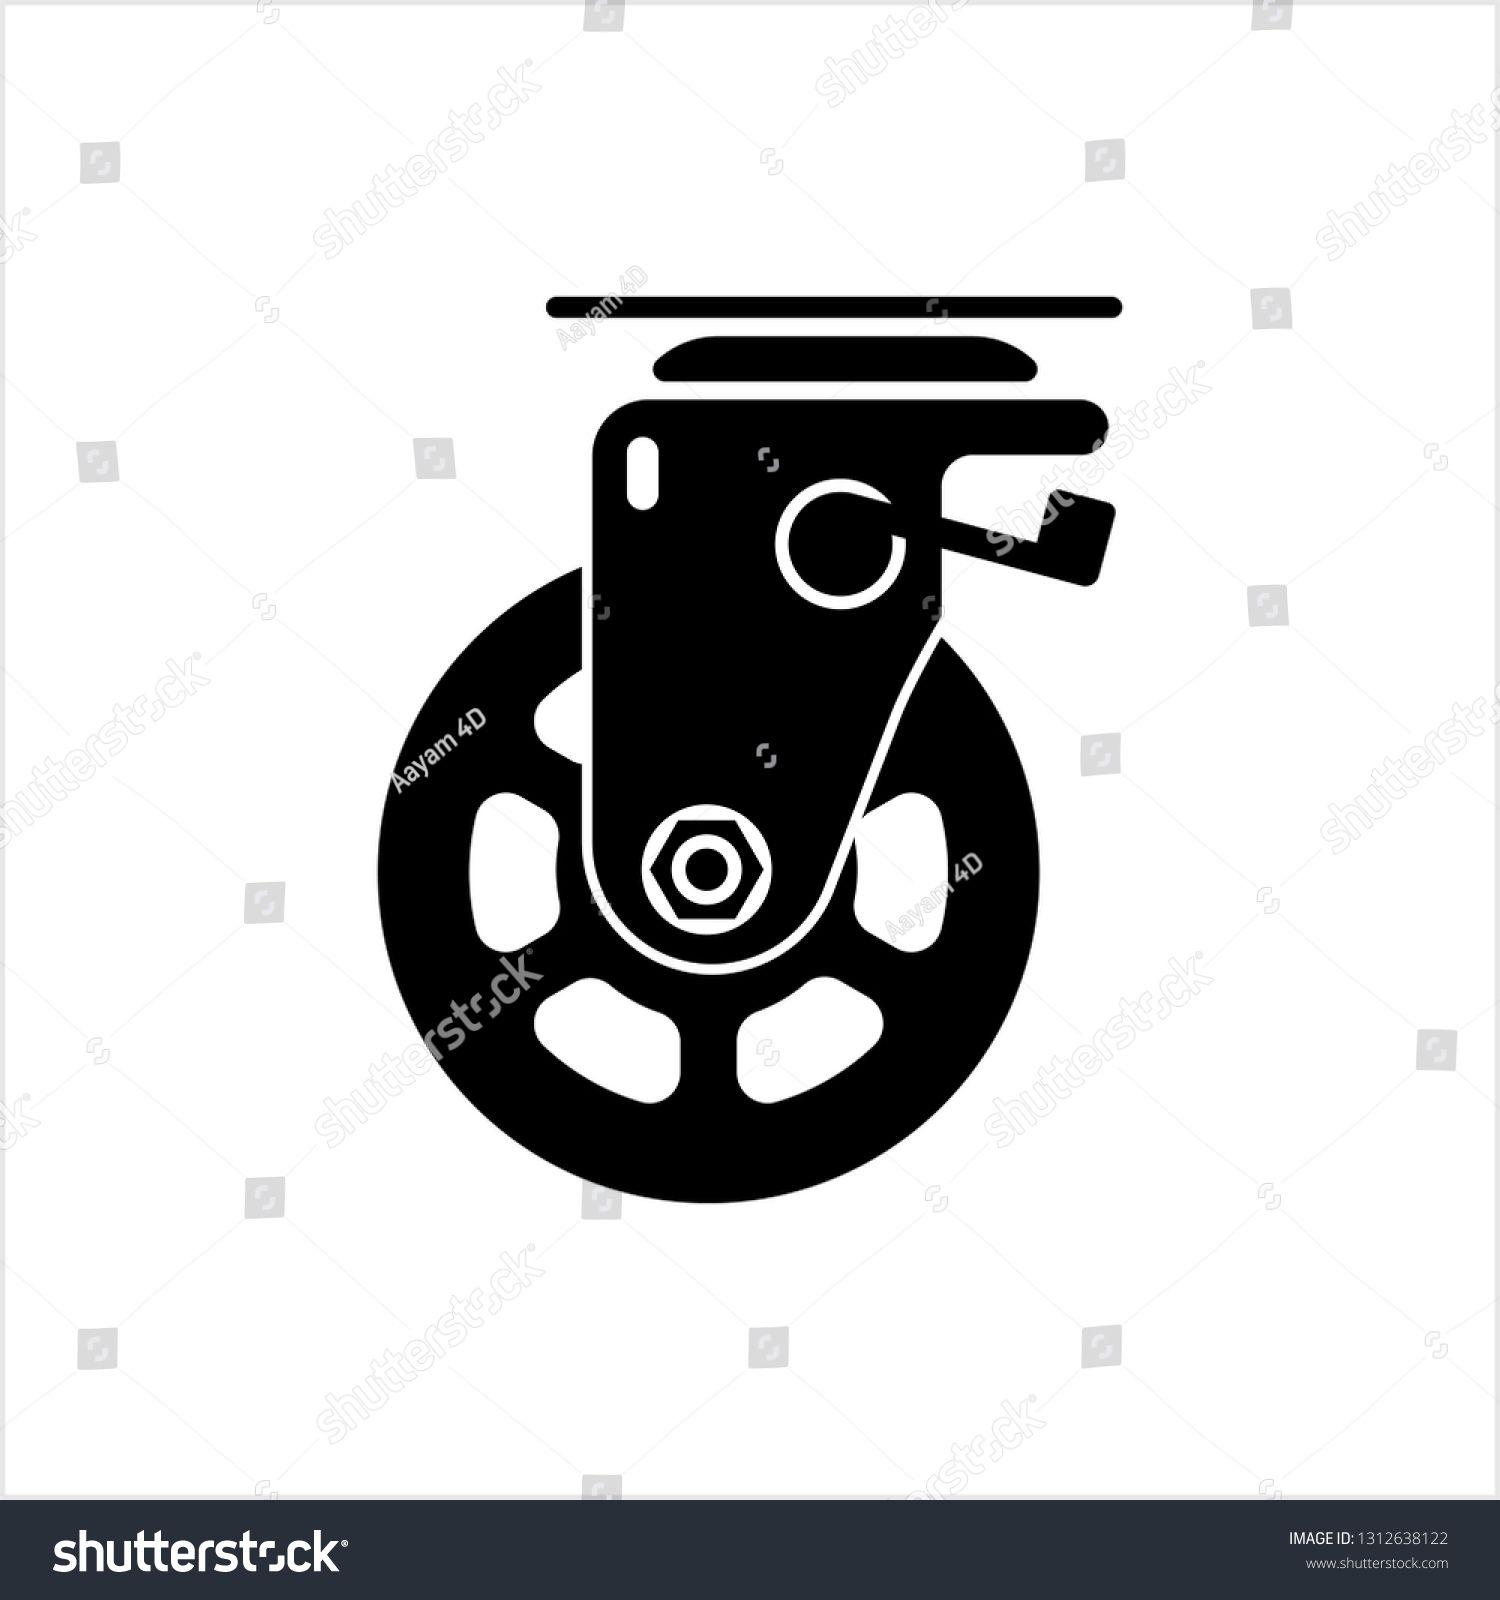 Caster Wheel Icon Vector Art Illustration #Ad , #Sponsored, #Icon#Wheel#Caster#Illustration